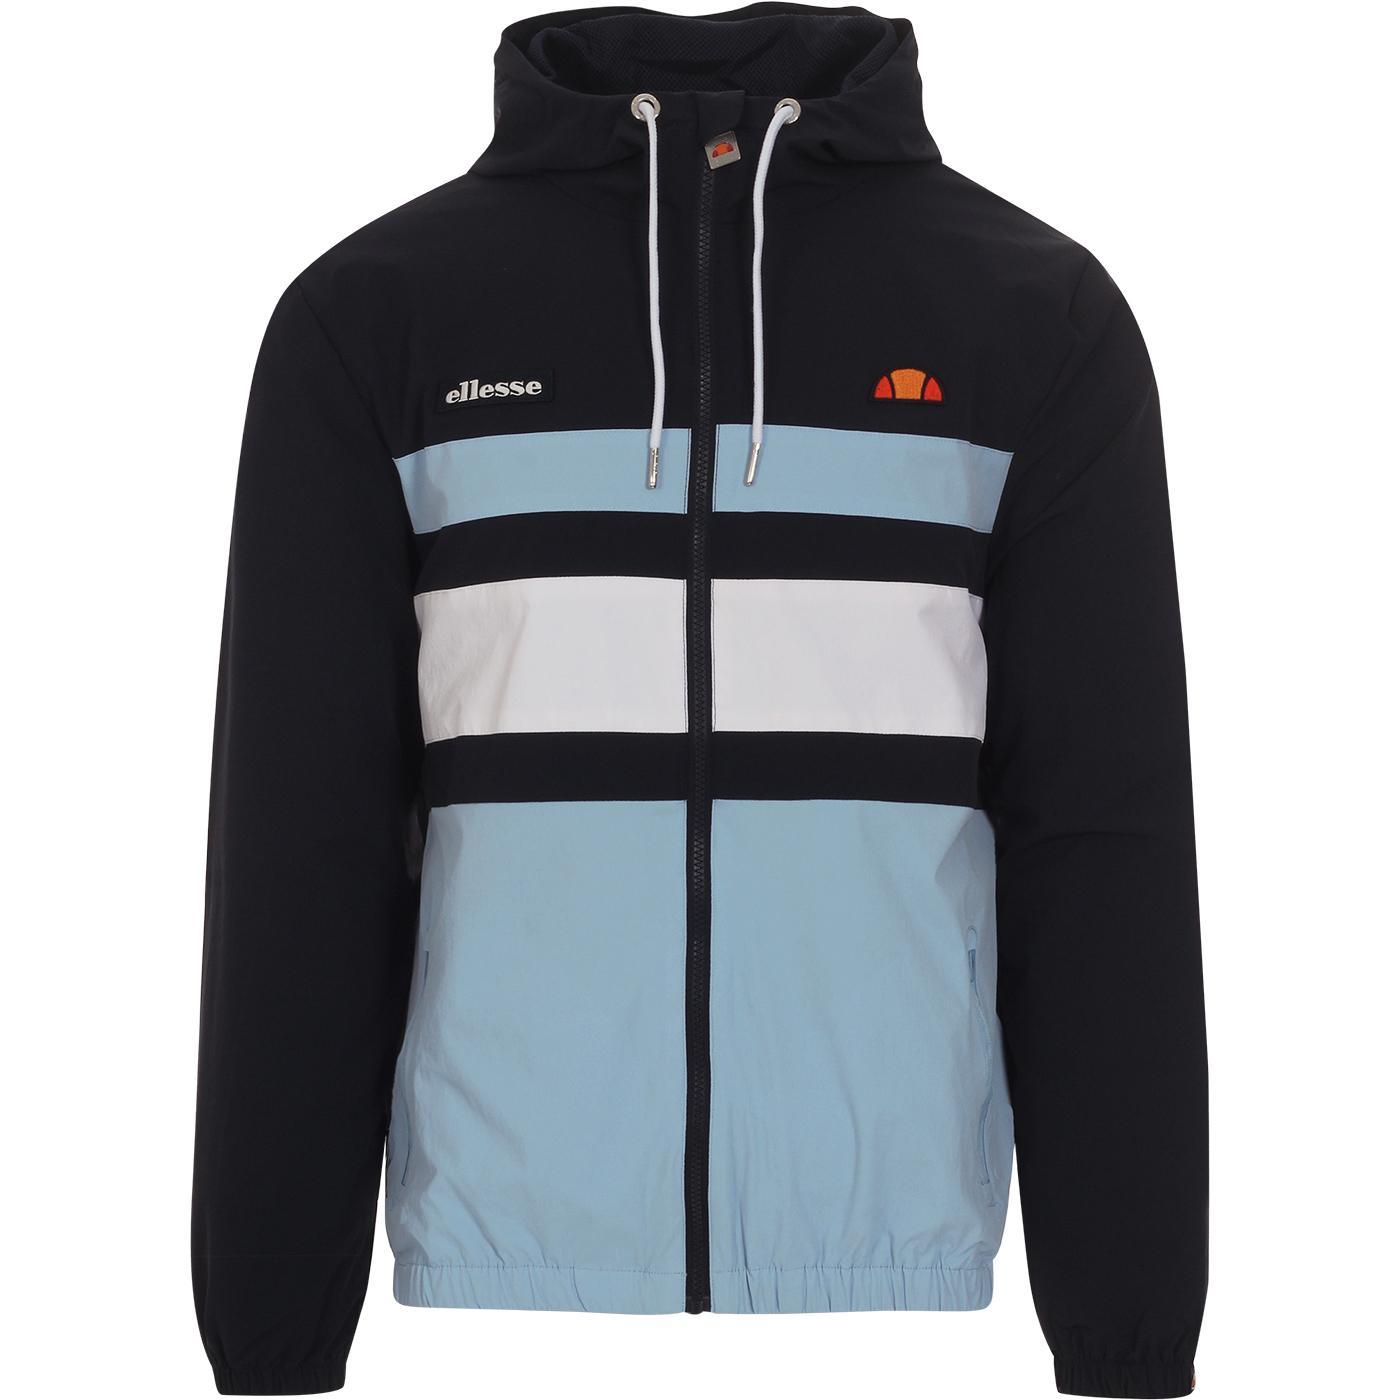 Nucci ELLESSE Retro 80's Casuals Stripe Jacket